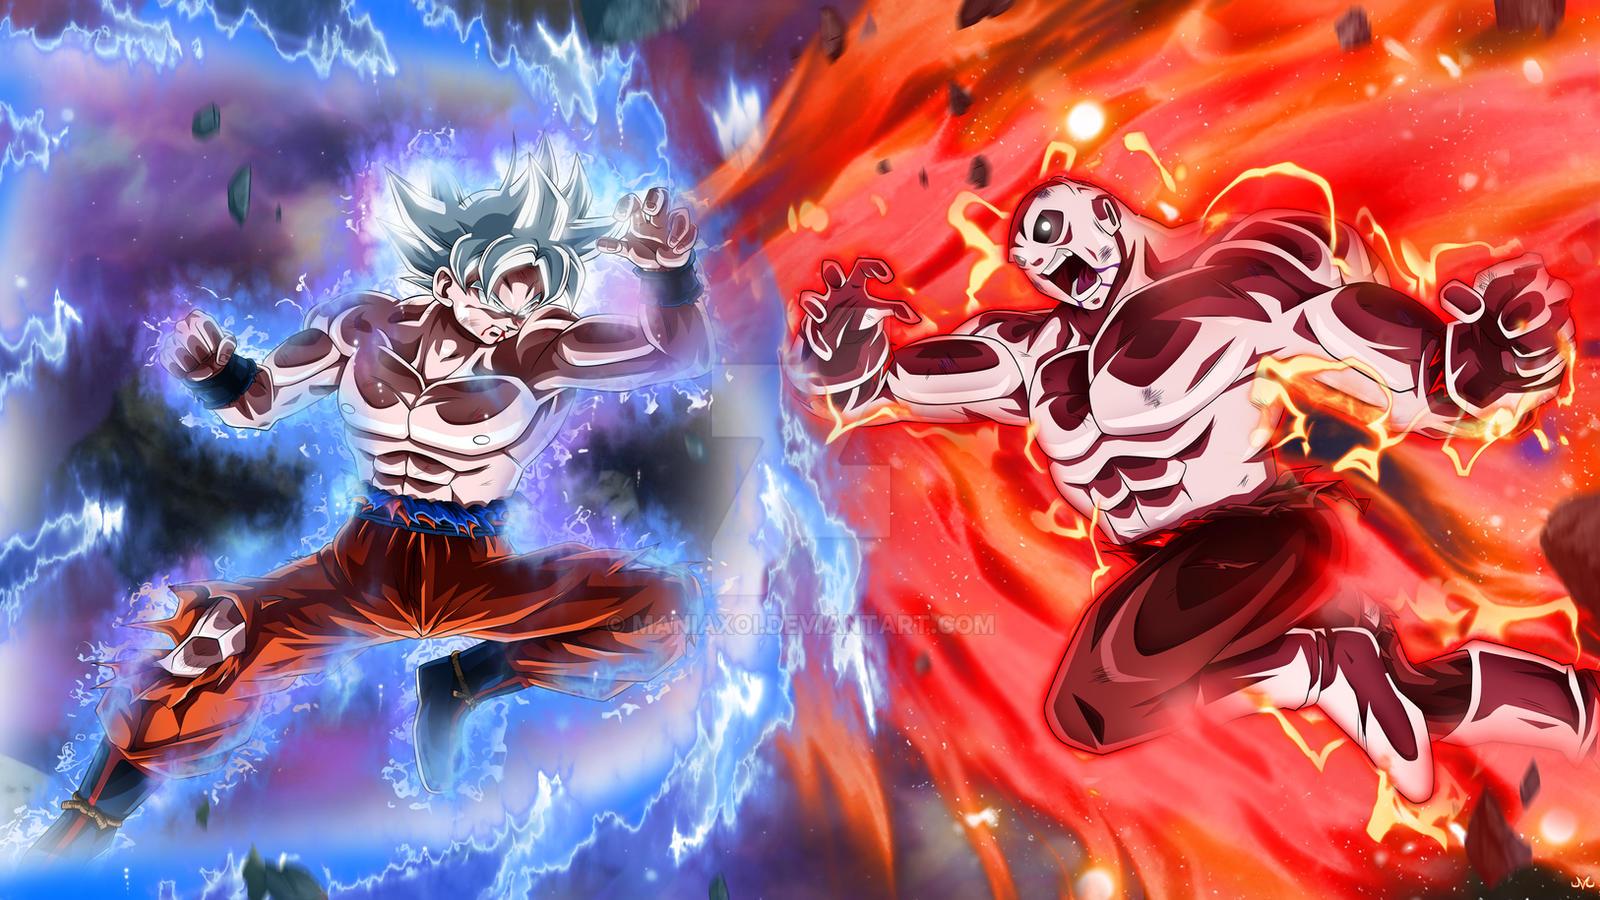 Goku Full Ultra Instinct VS Jiren By Maniaxoi On DeviantArt